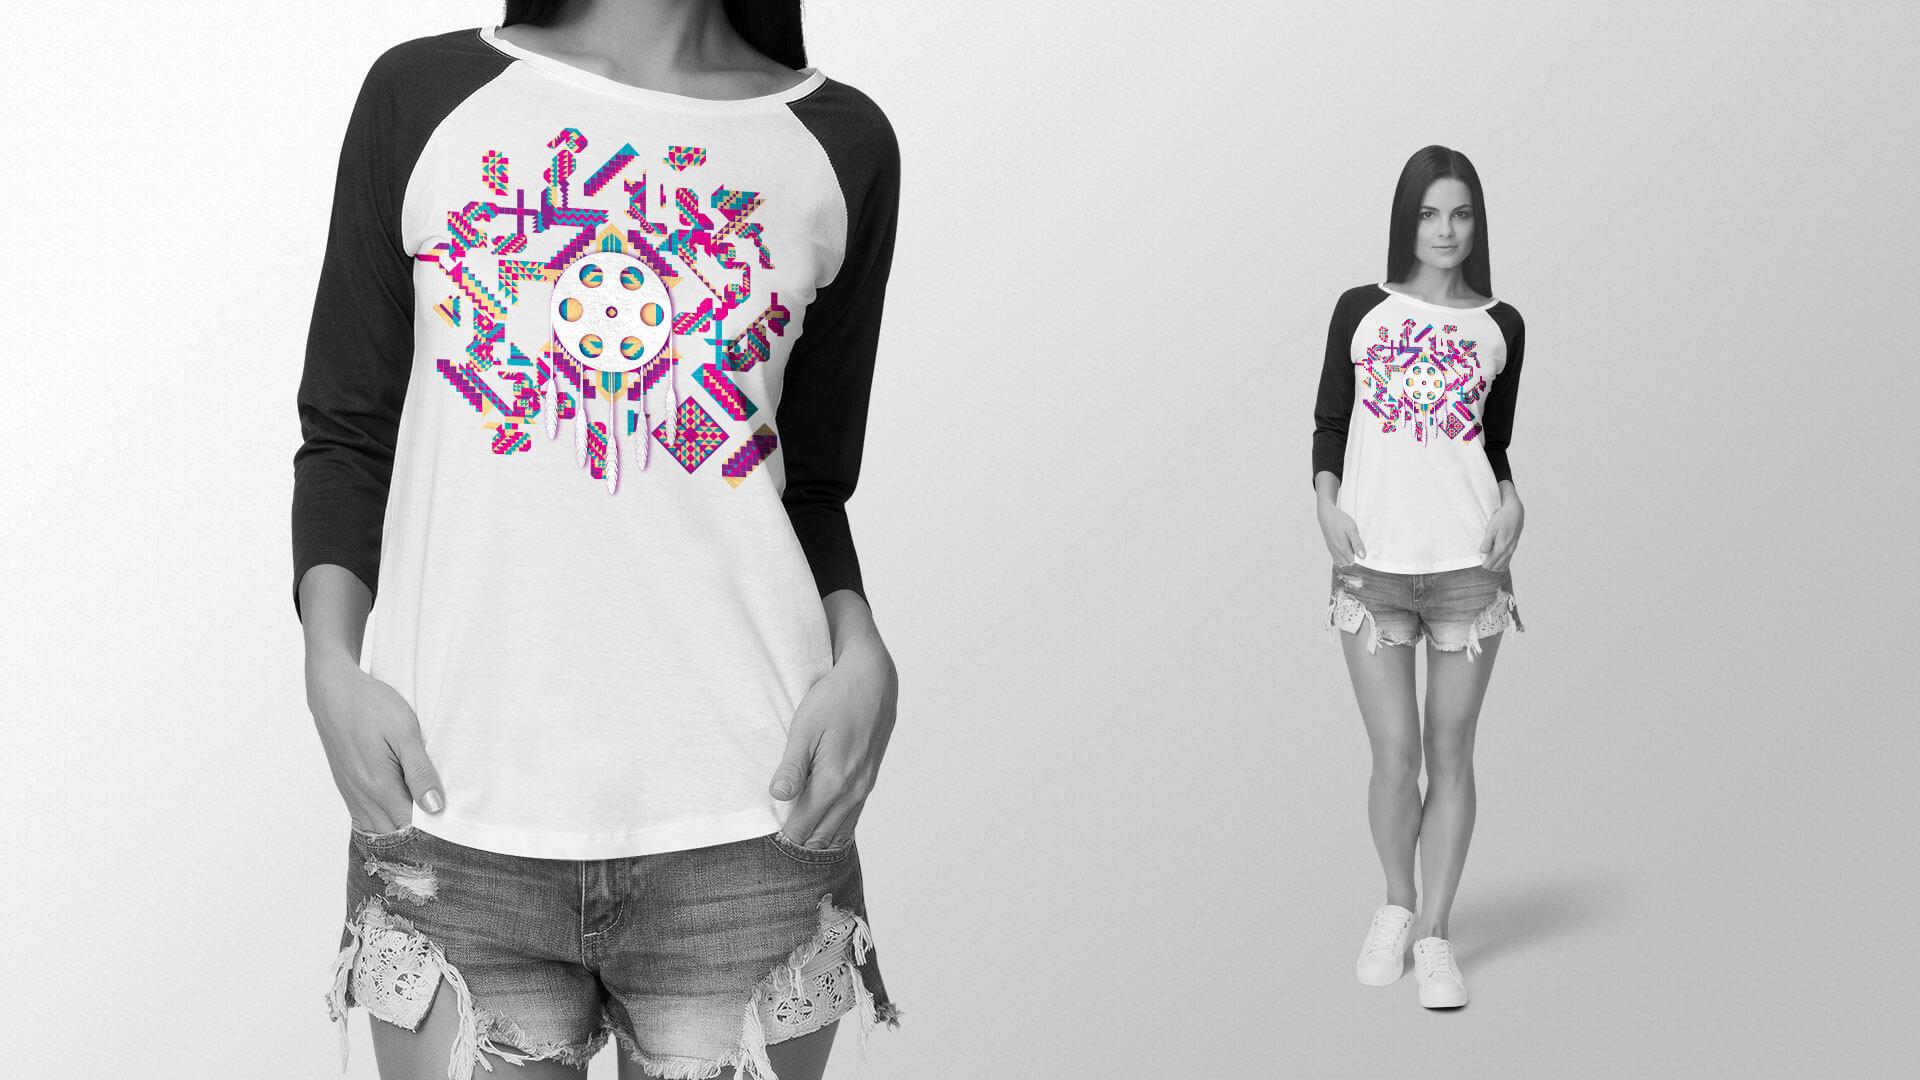 A long sleeve shirt design for the Winnipeg Aboriginal Film Festival